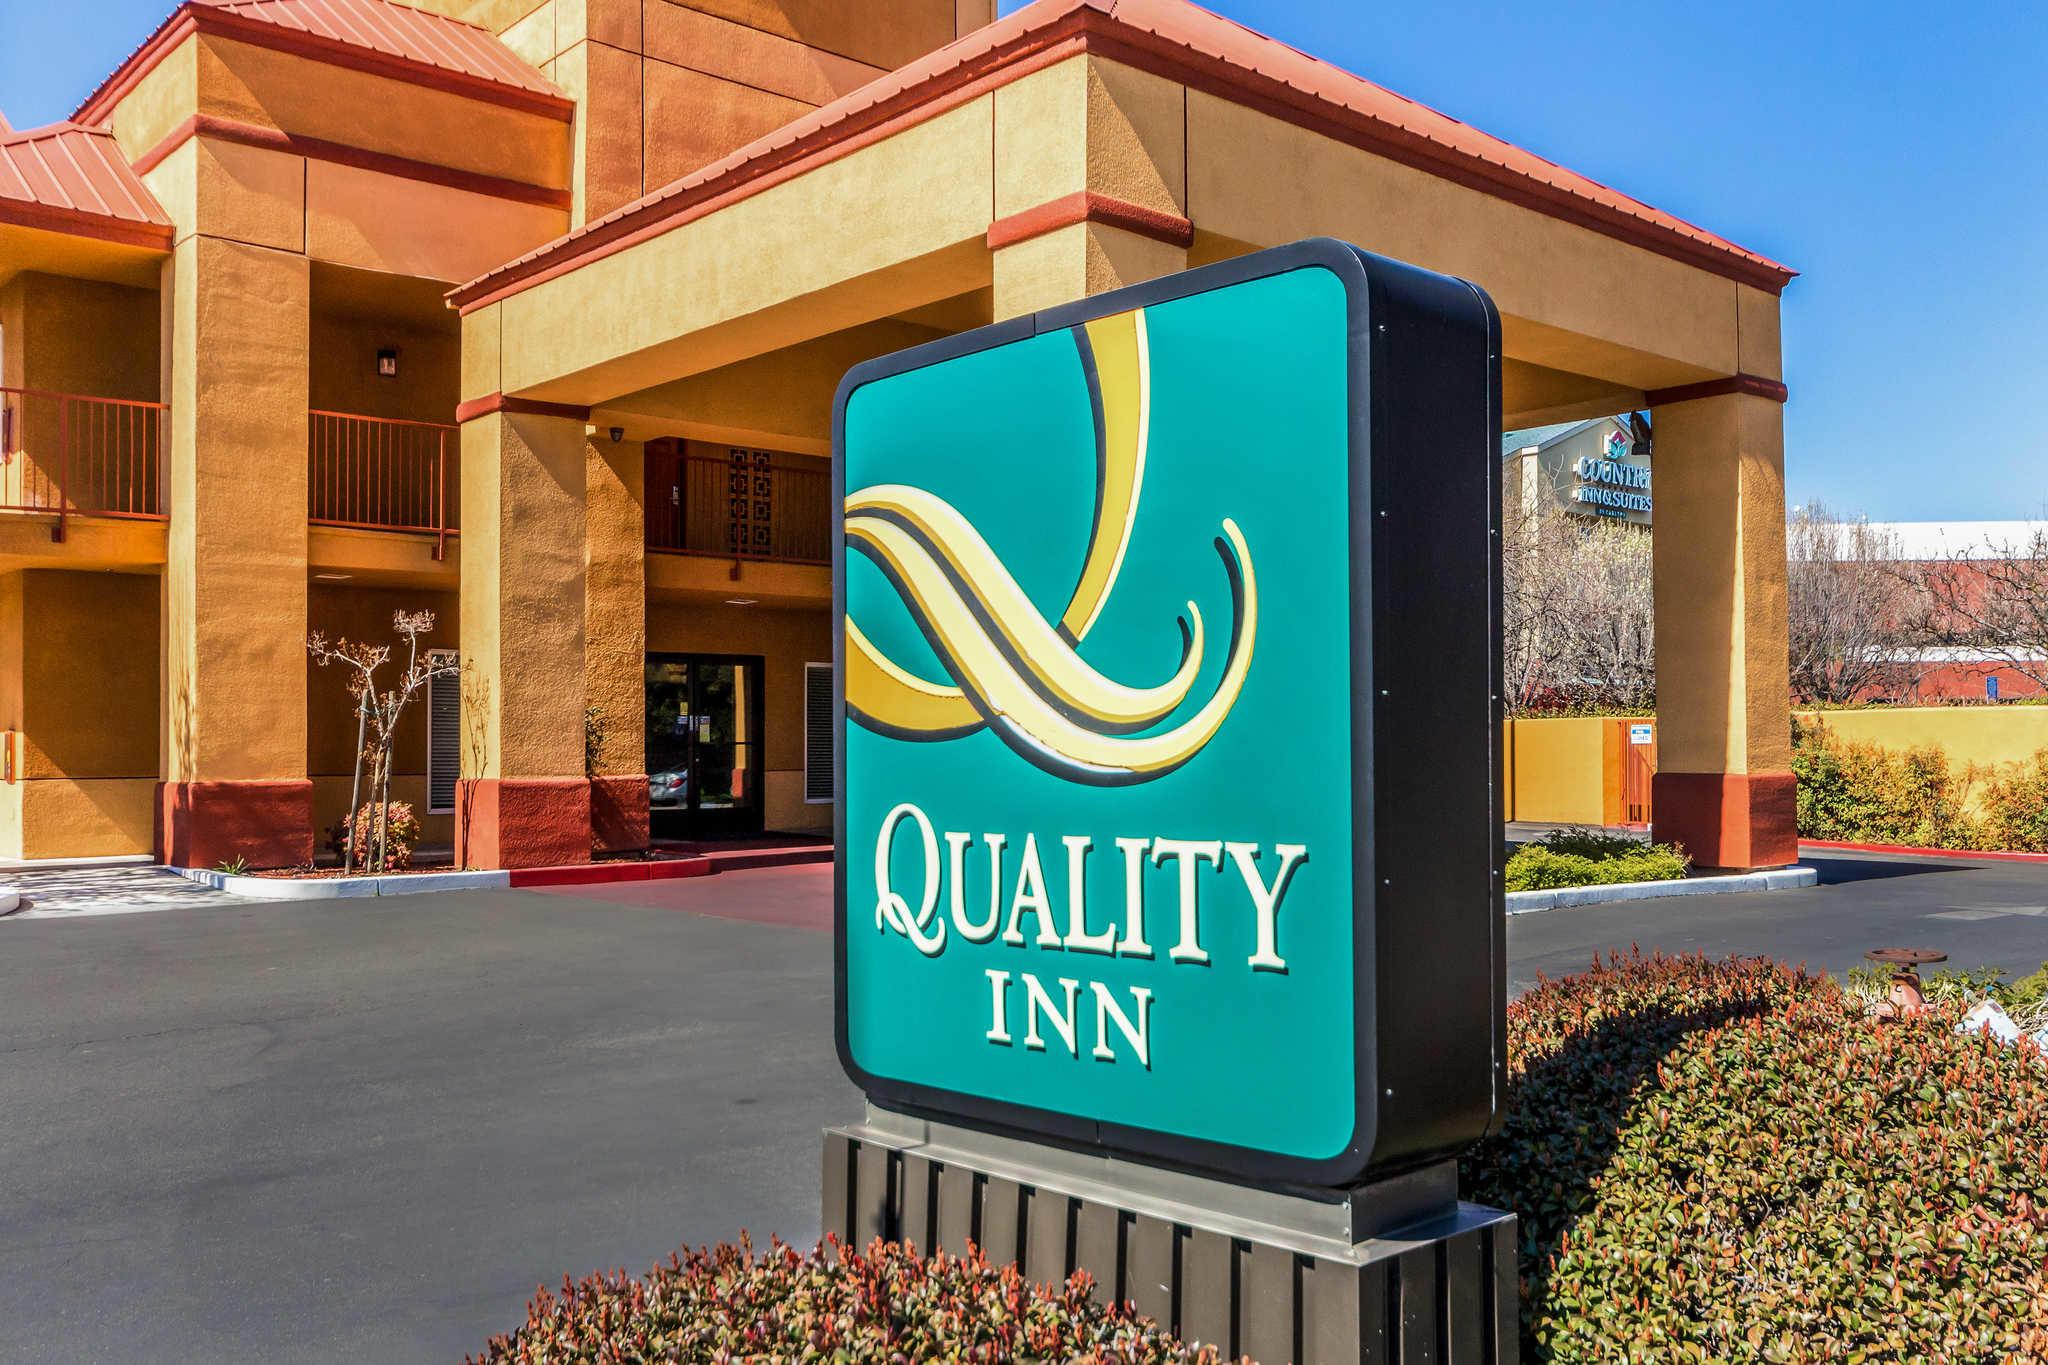 Quality Inn Fresno Near University image 32